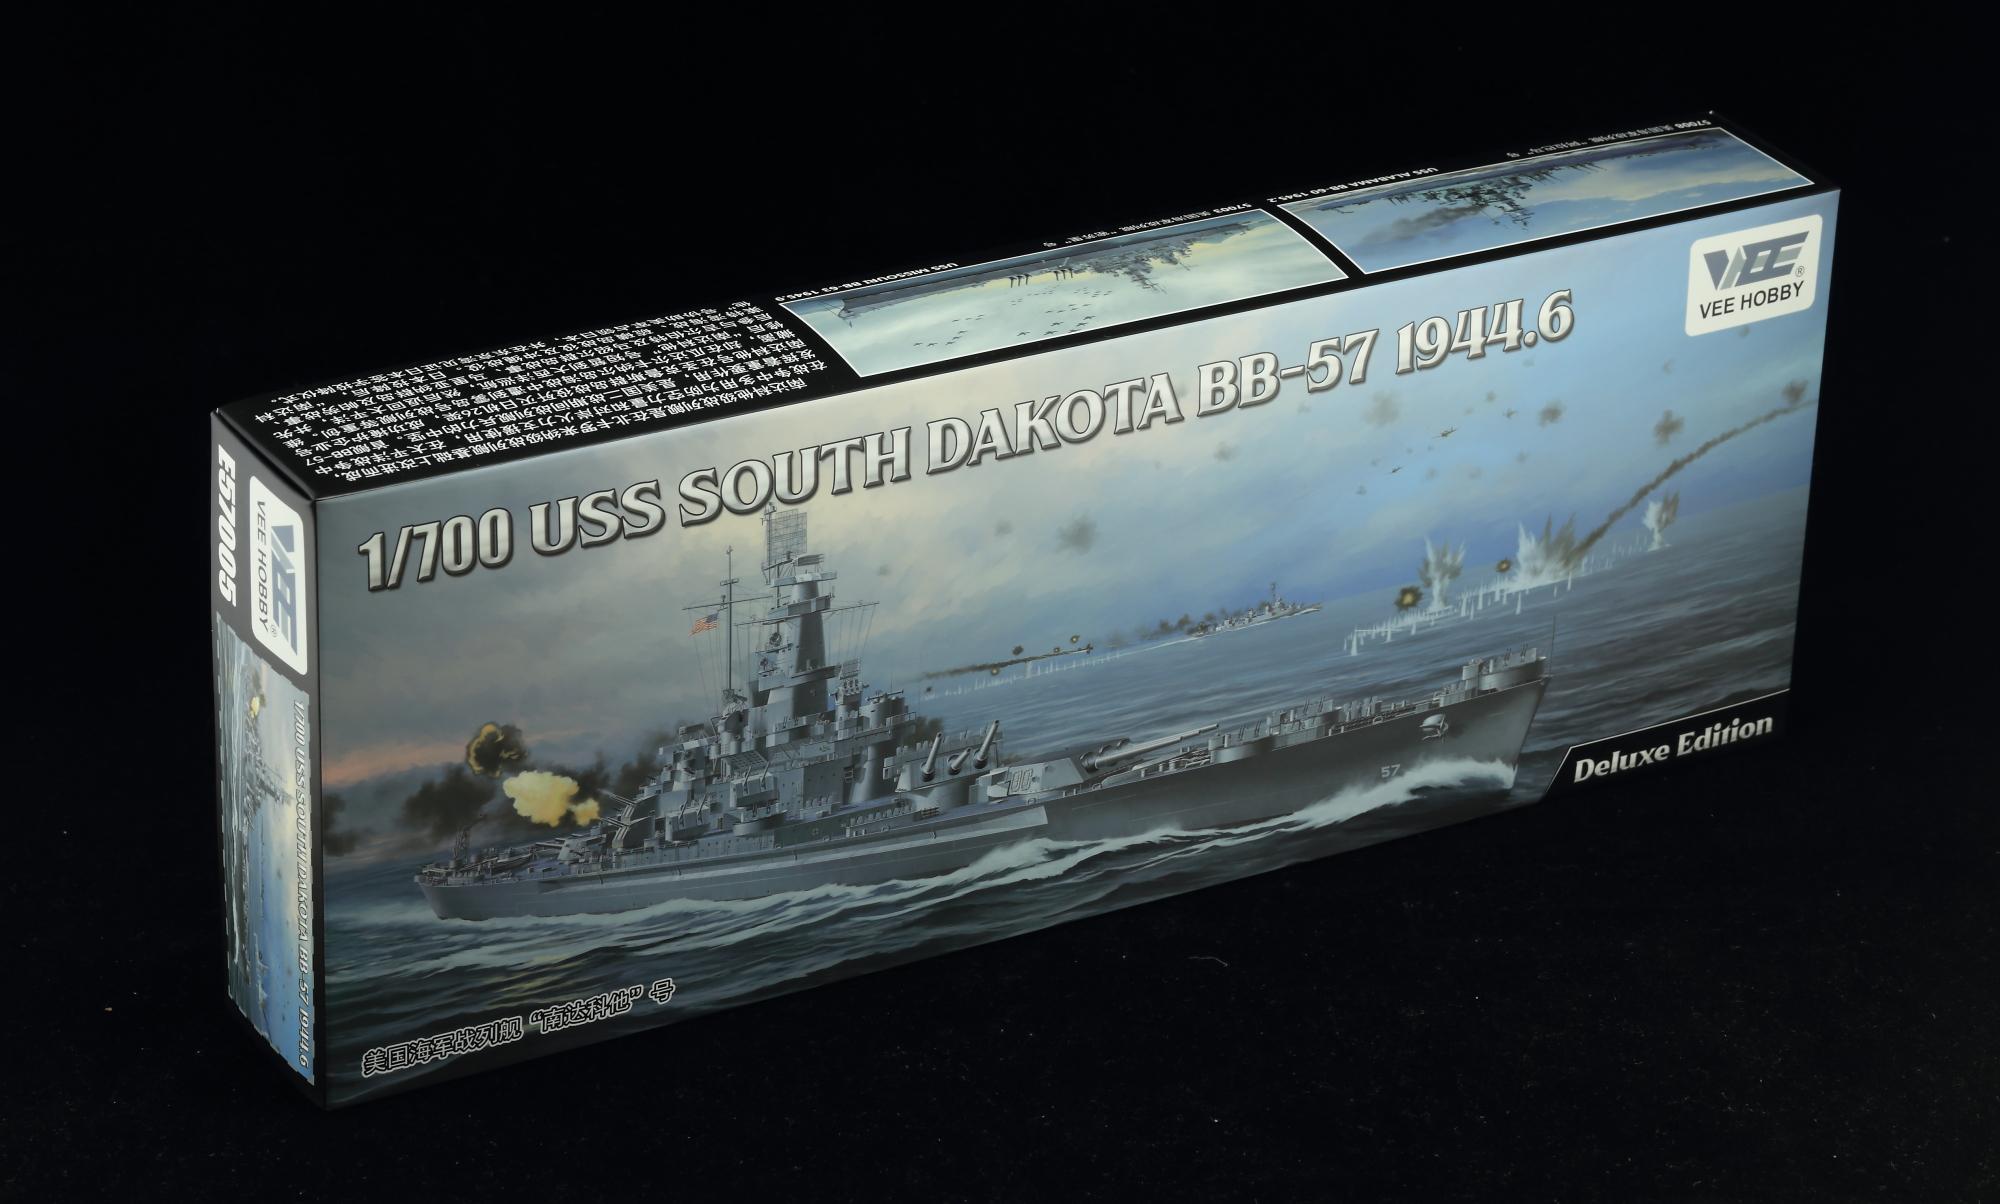 Vee Hobby 1/700 South Dakota Battleship BB-57 1944 (Professional Edition)